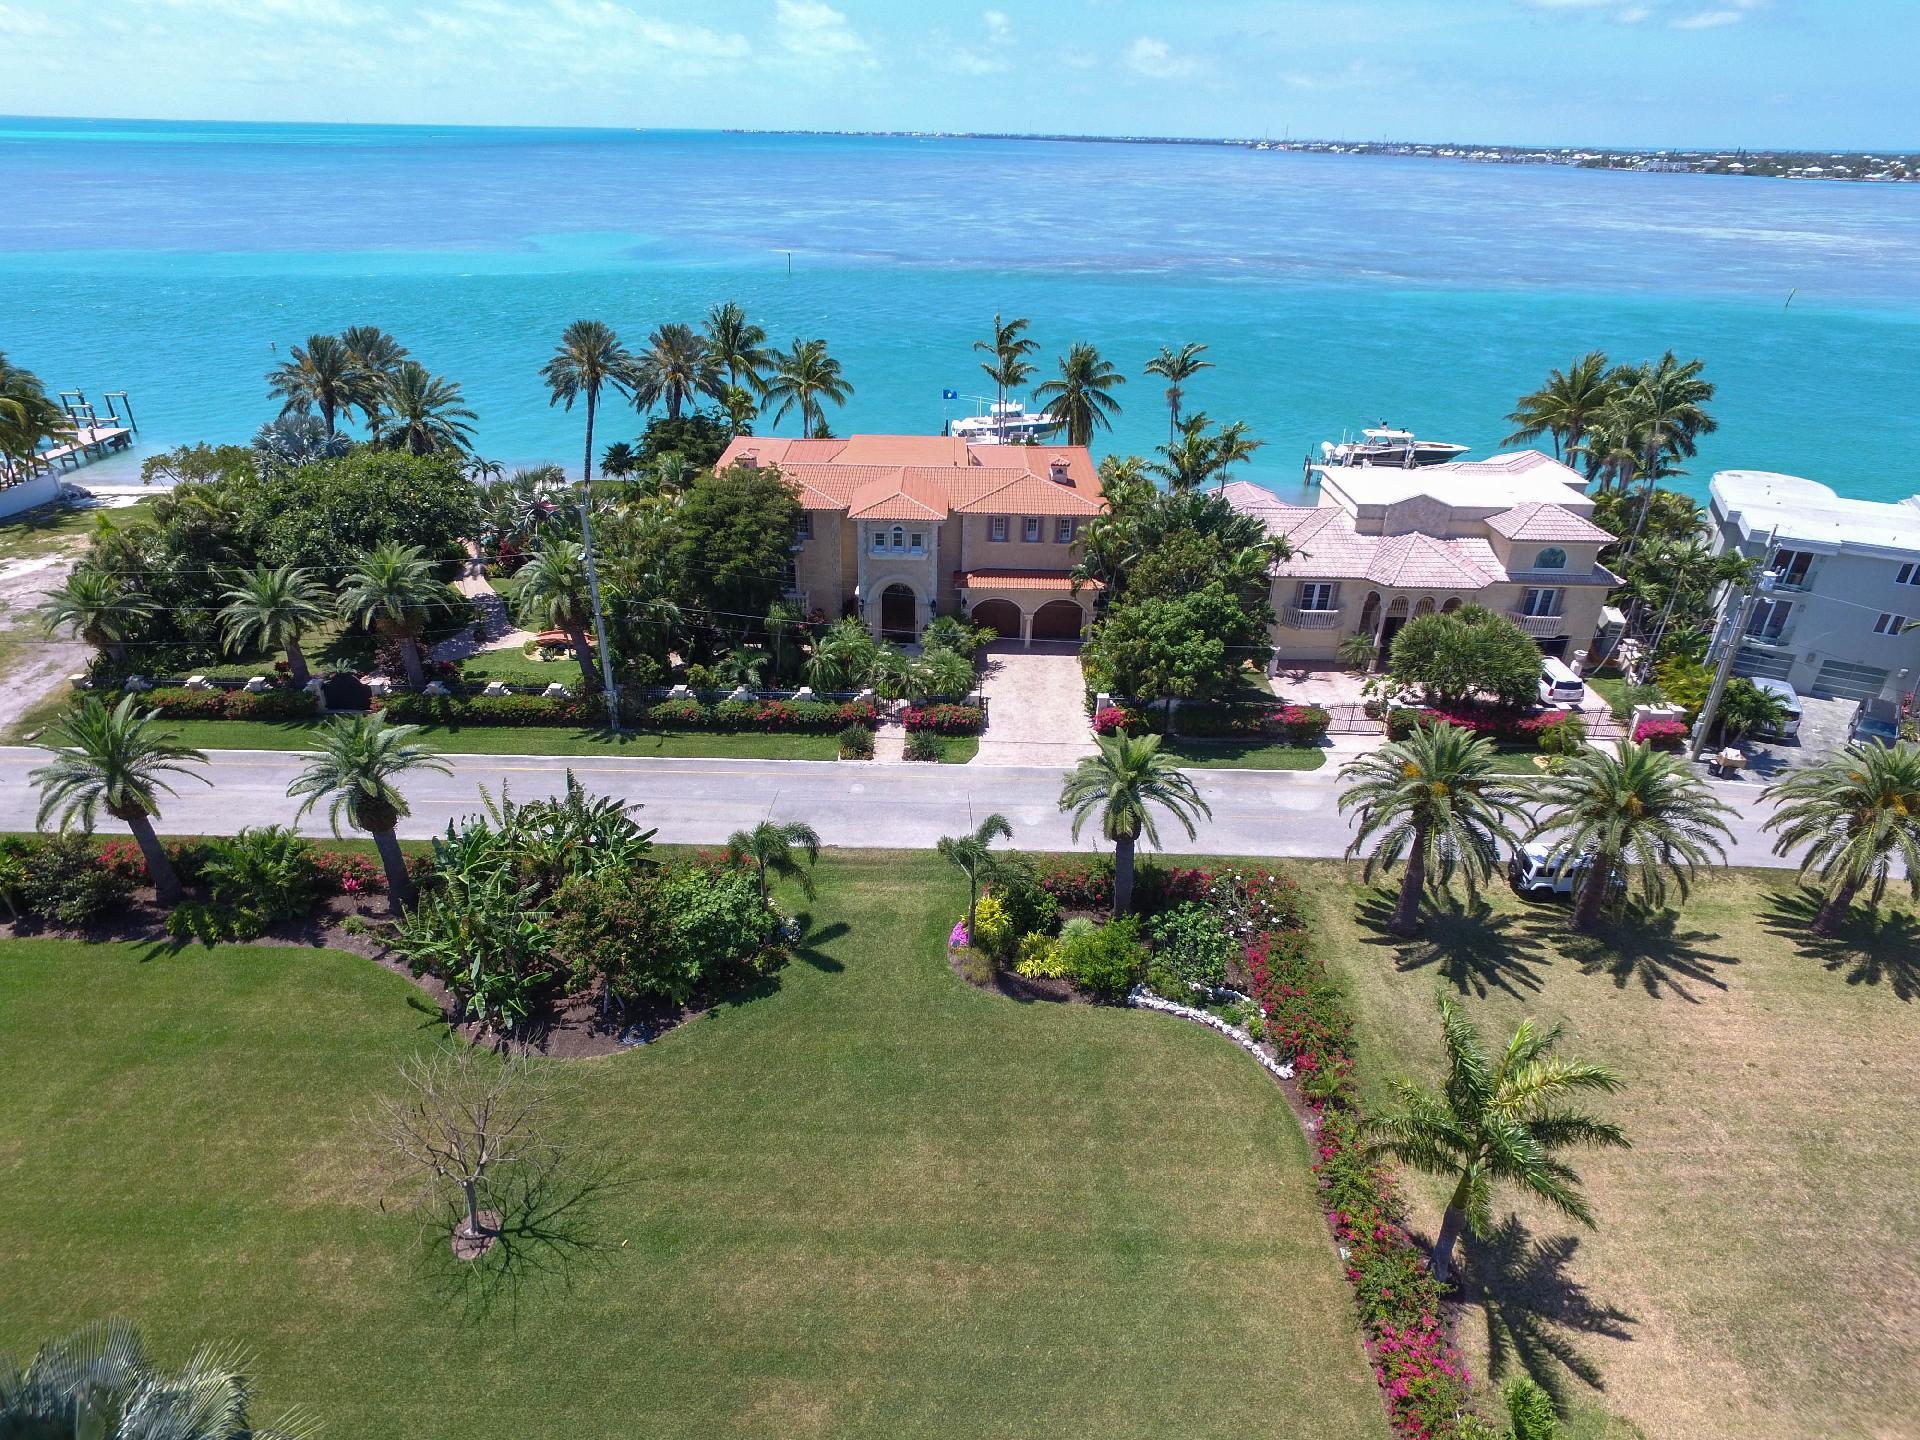 FL Keys Real Estate - Spring 2021 Newsletter Main Photo